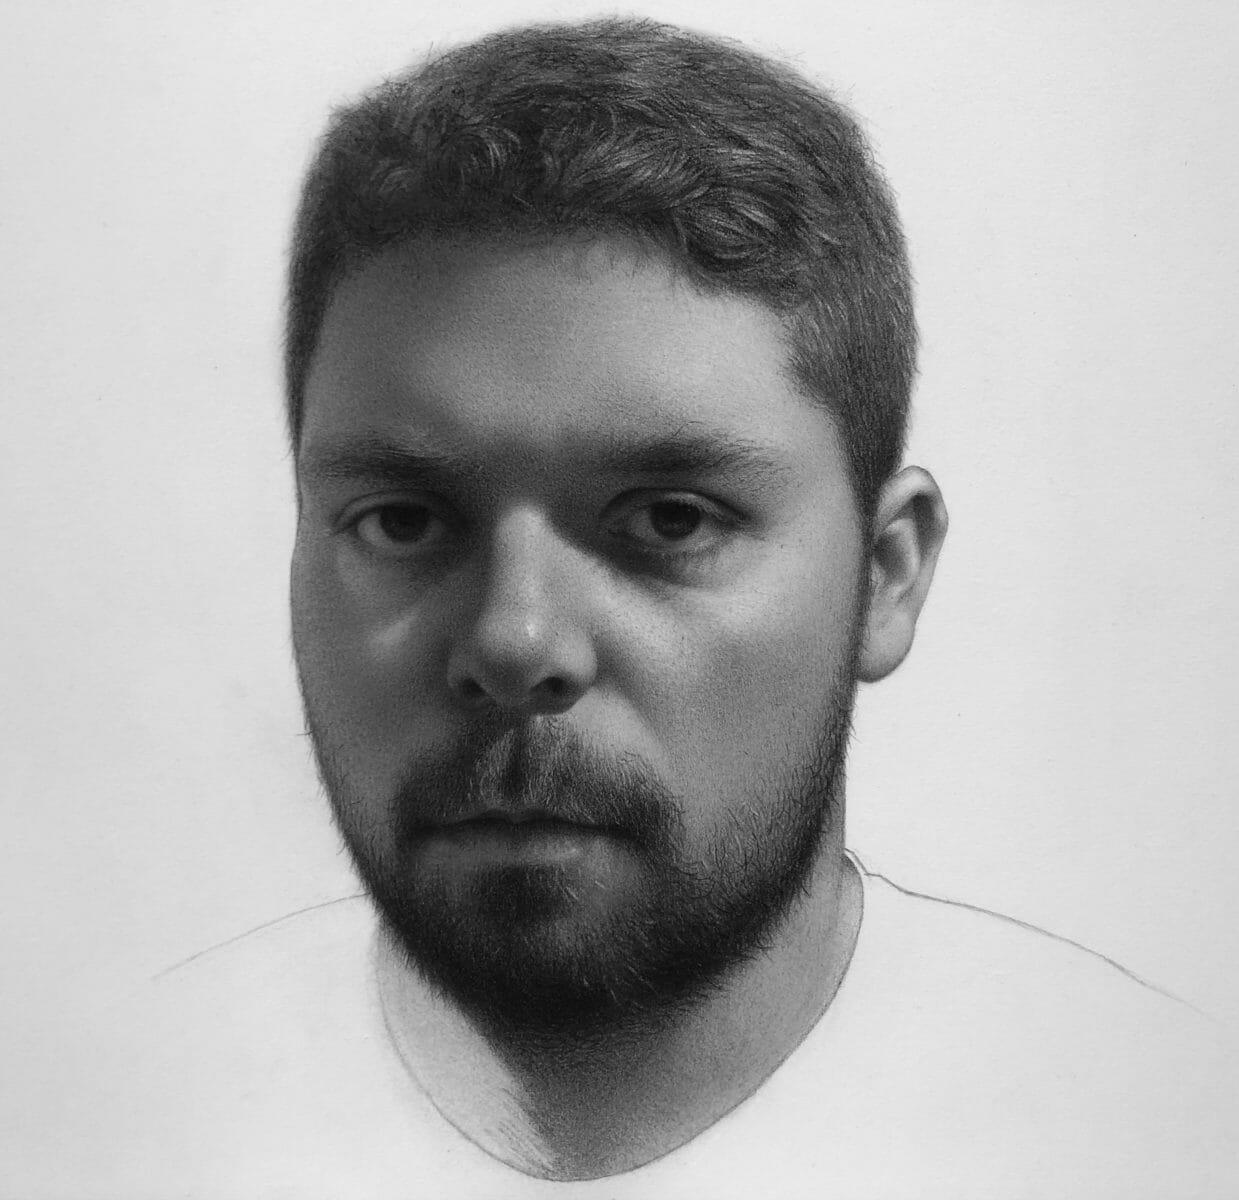 Self-Portrait, Graphite and Carbon Black on White Paper